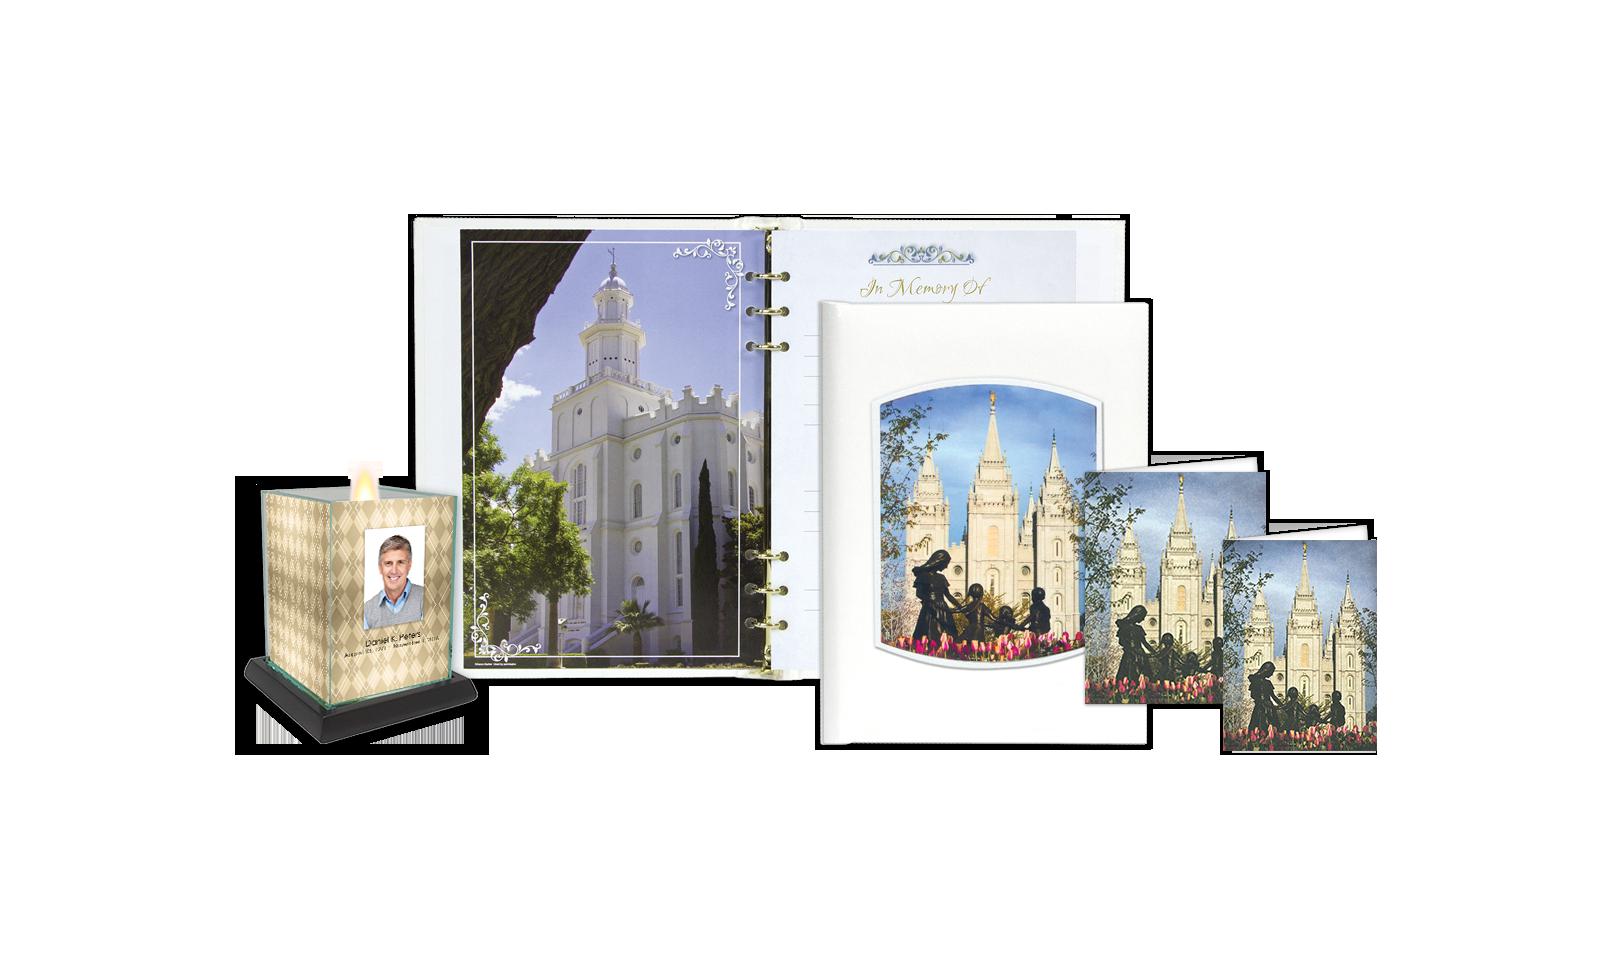 ROL Latter Day Saints Salt Lake City Temple Embossed Series 304 LDS